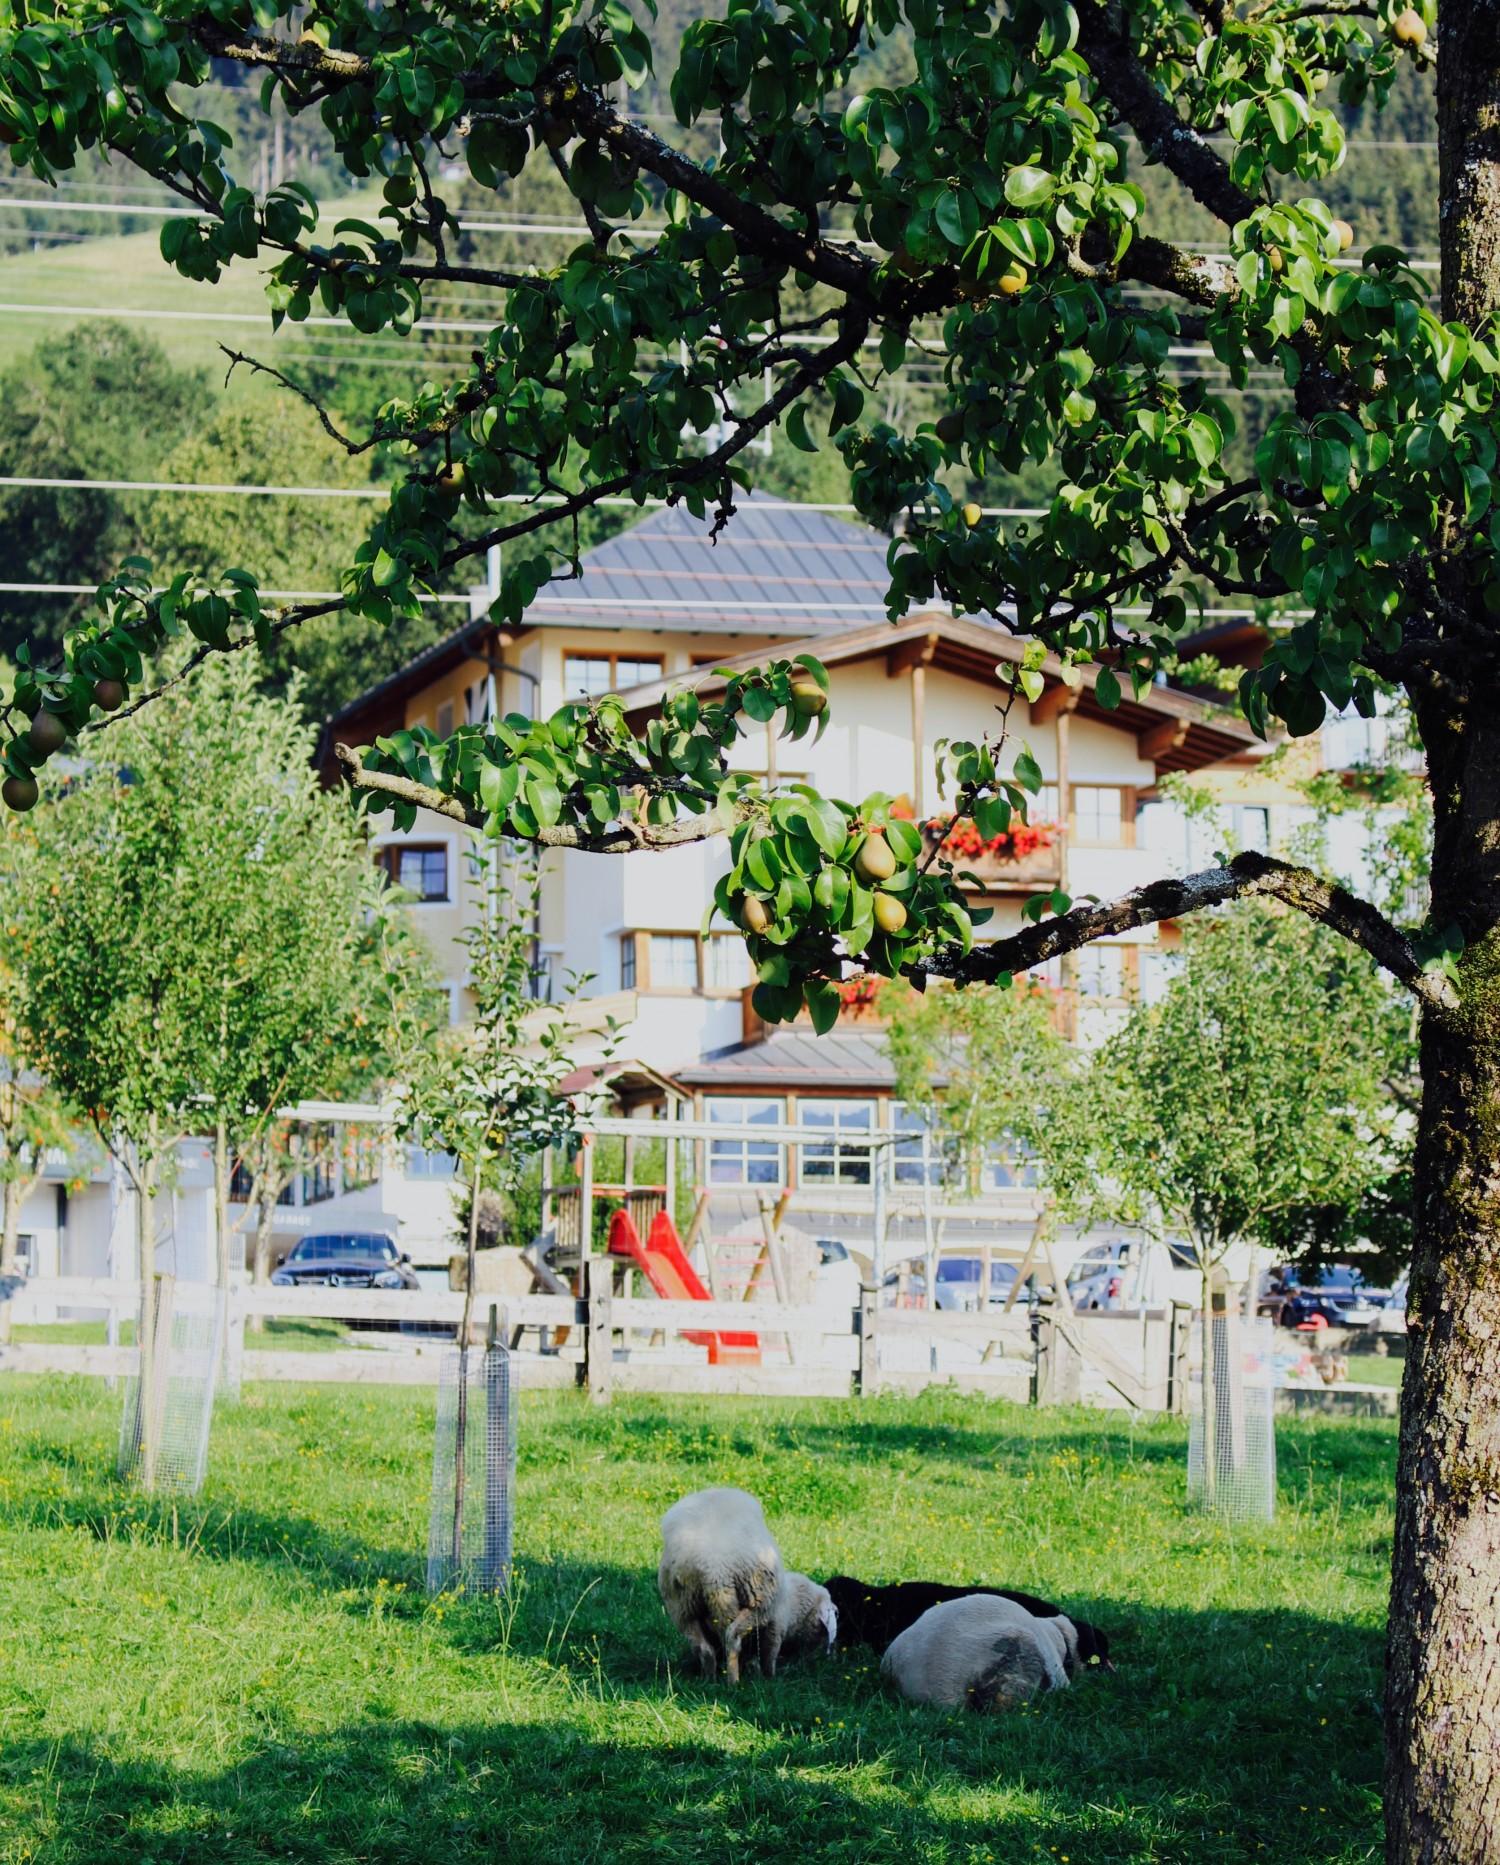 penzinghof-hotel-ostrig-annemette-voss10